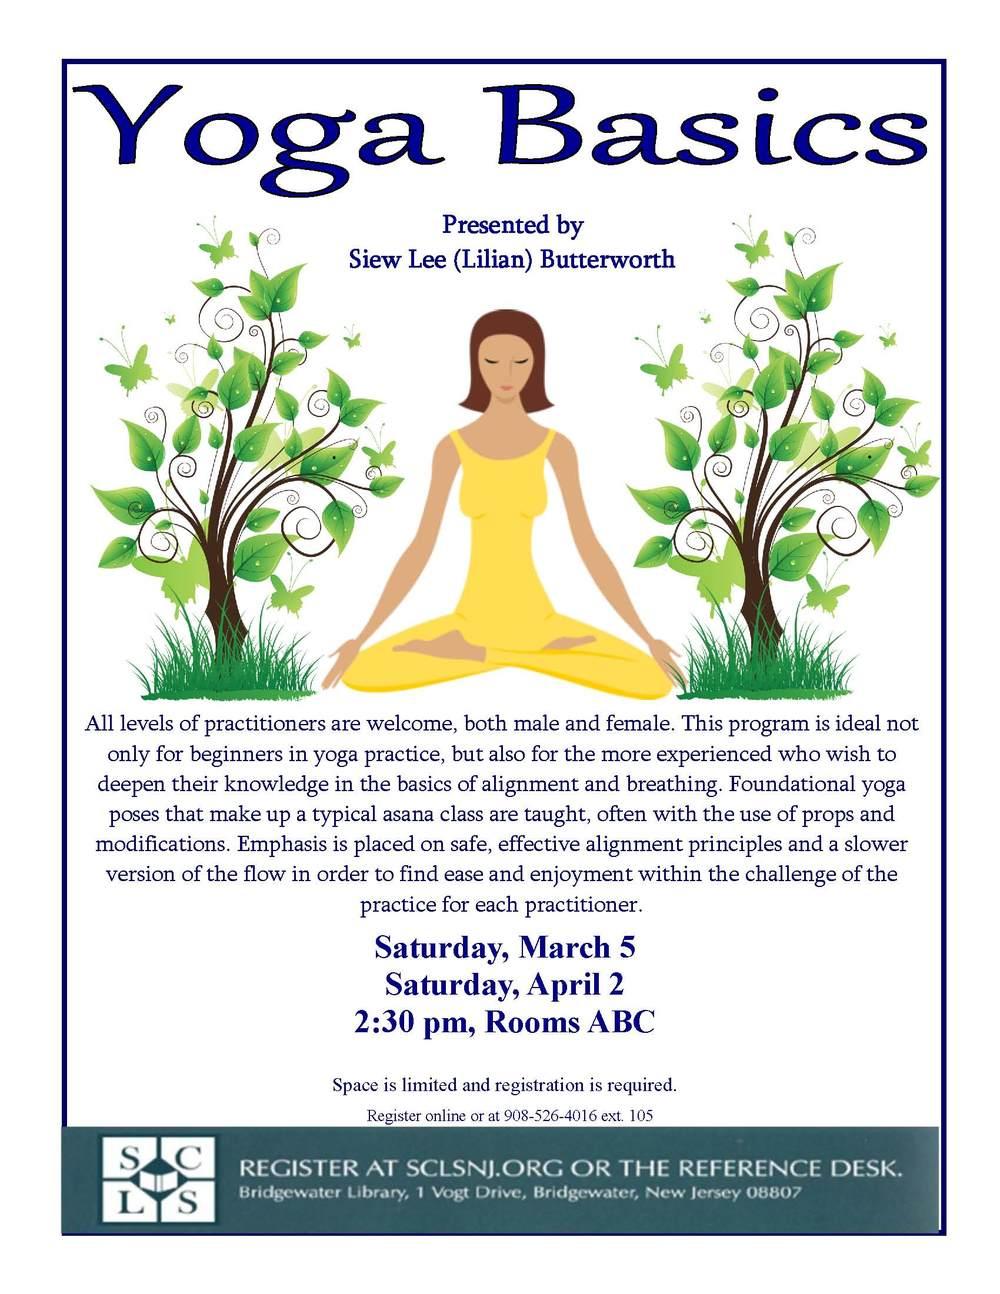 Free Community Yoga Class at Bridgewater Library. Register online at  Bridgewater Library website .